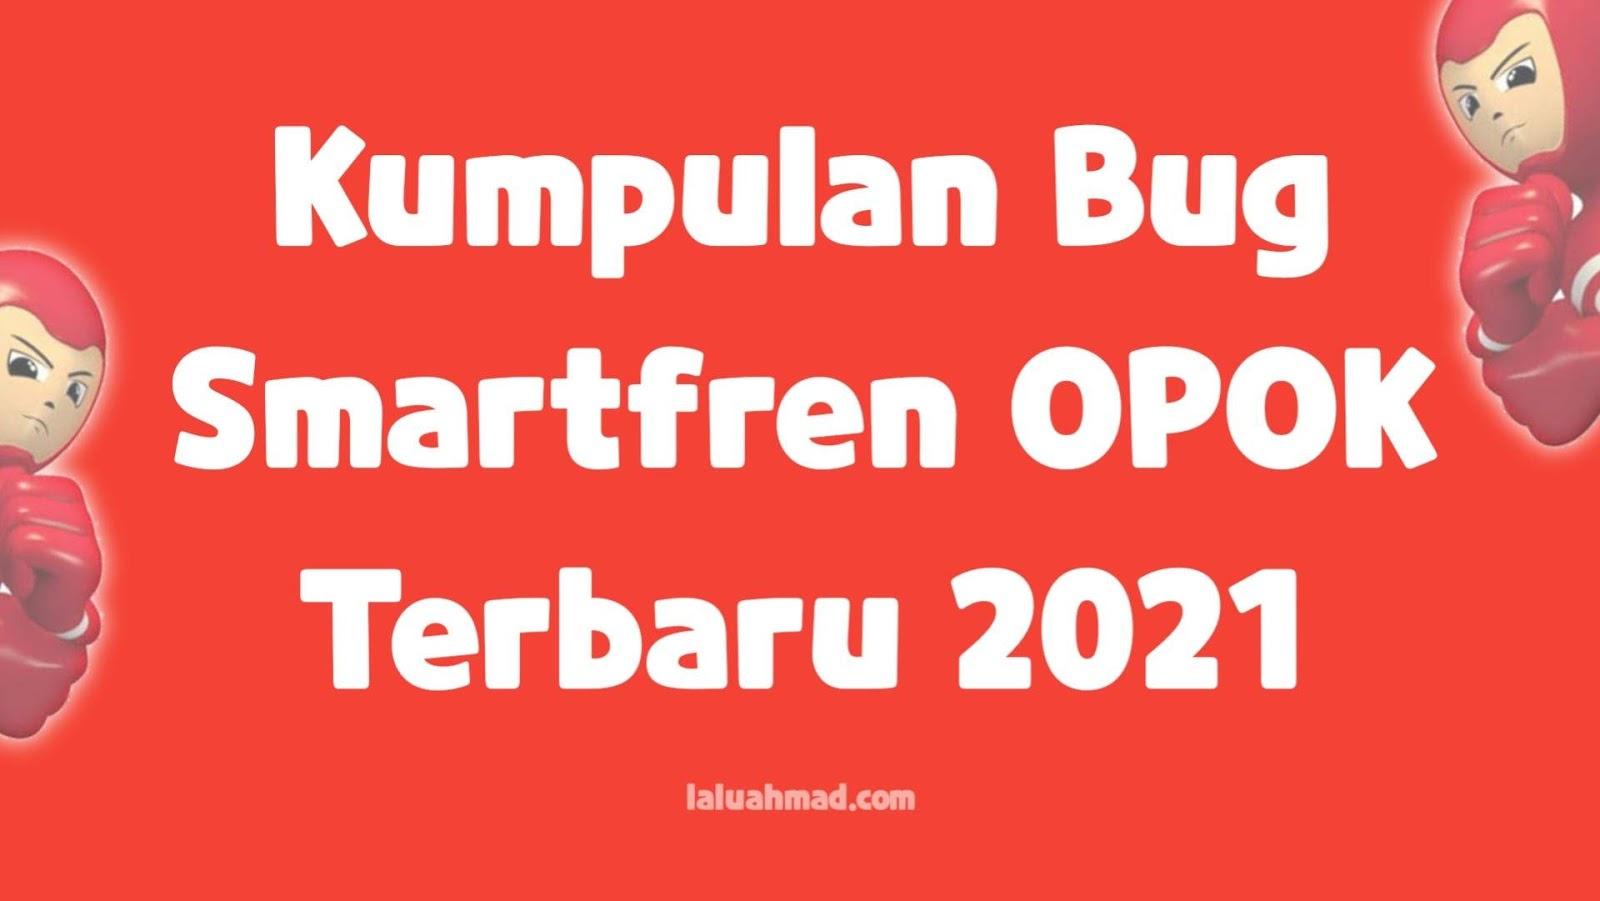 Kumpulan Bug Smartfren OPOK Terbaru 2021